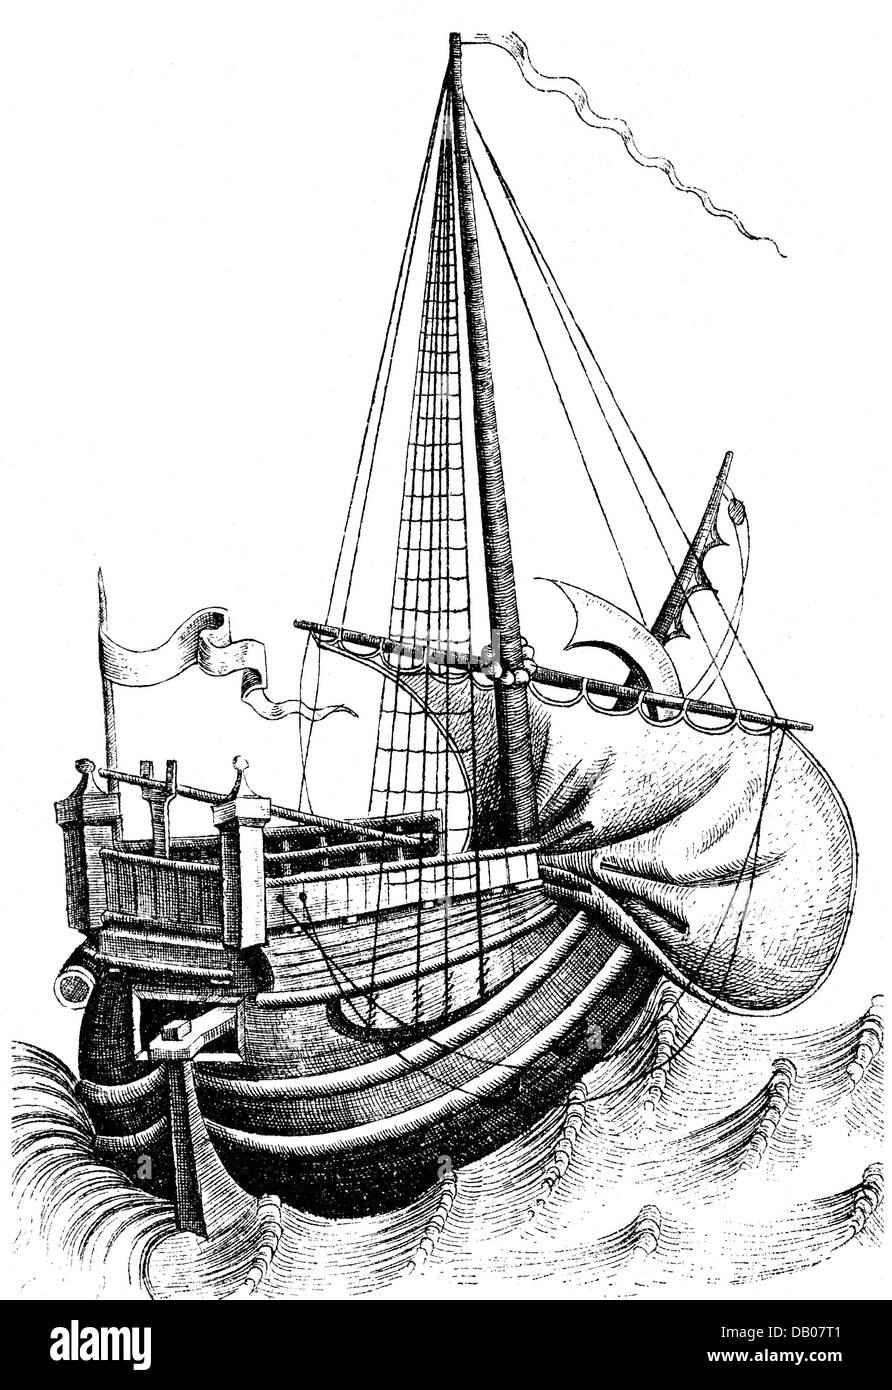 transport / transportation, navigation, sailing ships, cog, copper engraving, 15th century, cogs, sailing ship, - Stock Image